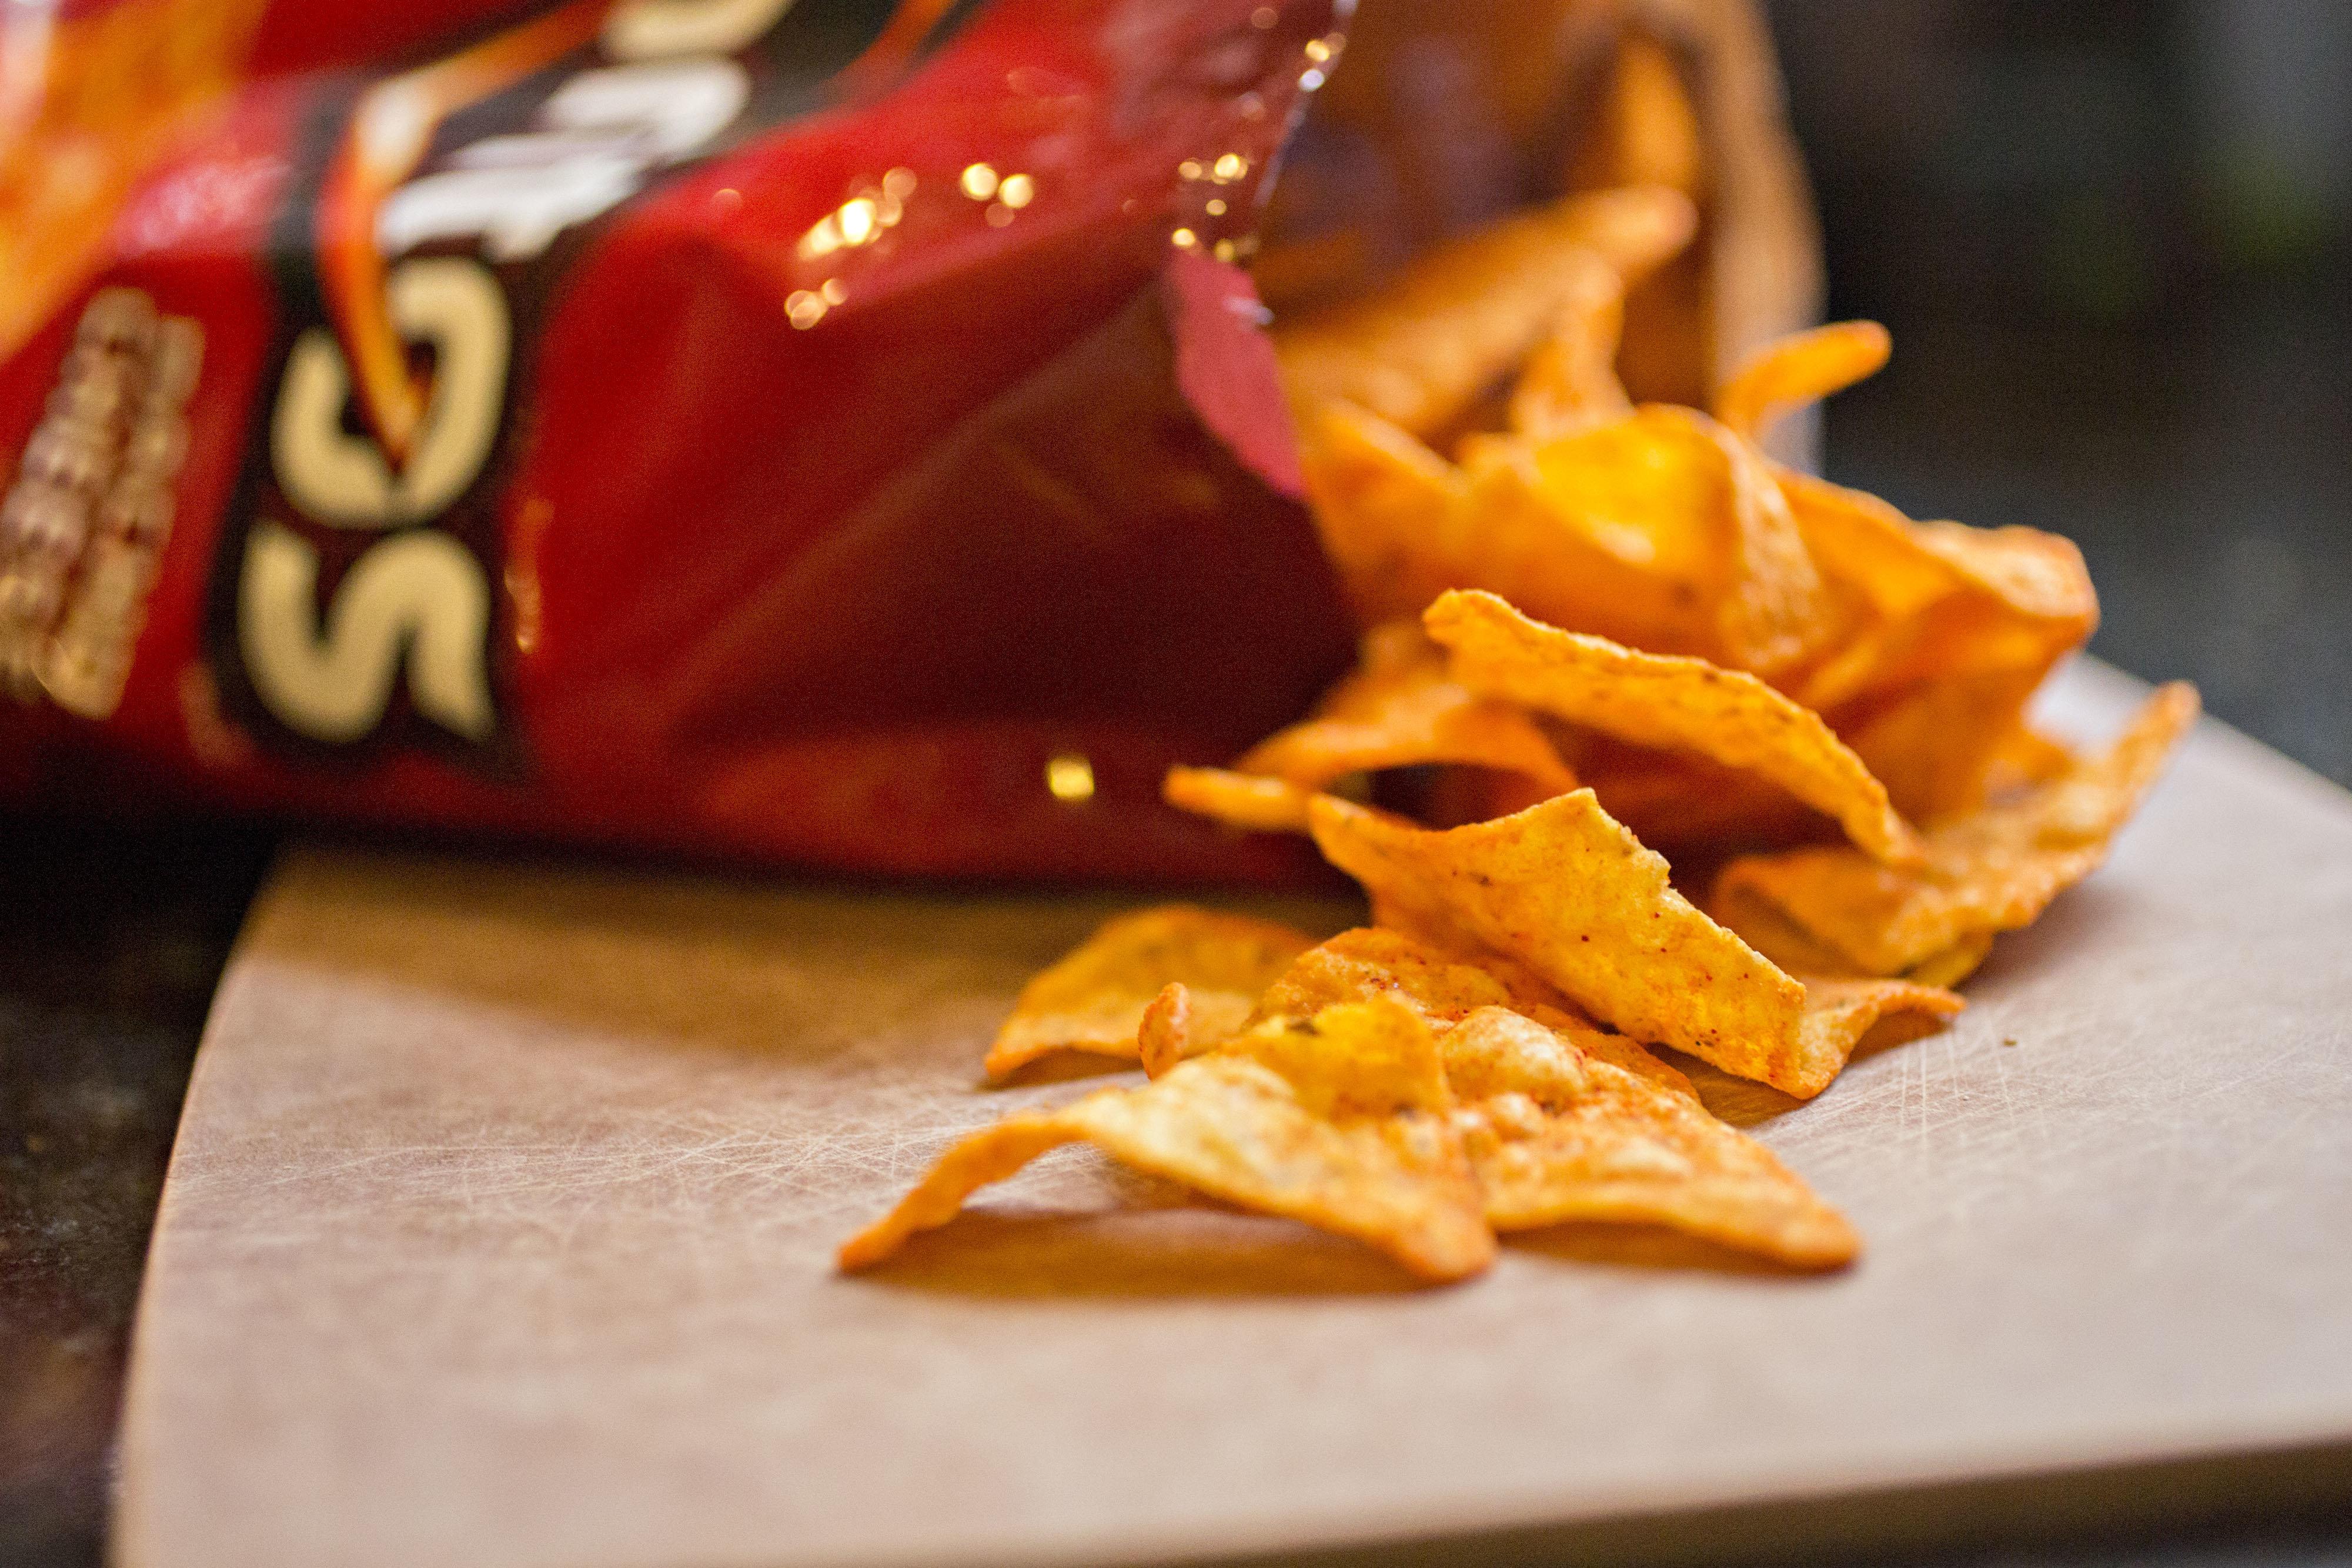 Doritos' New 'Lady-Friendly' Crisps Go Down Like A Sack Of